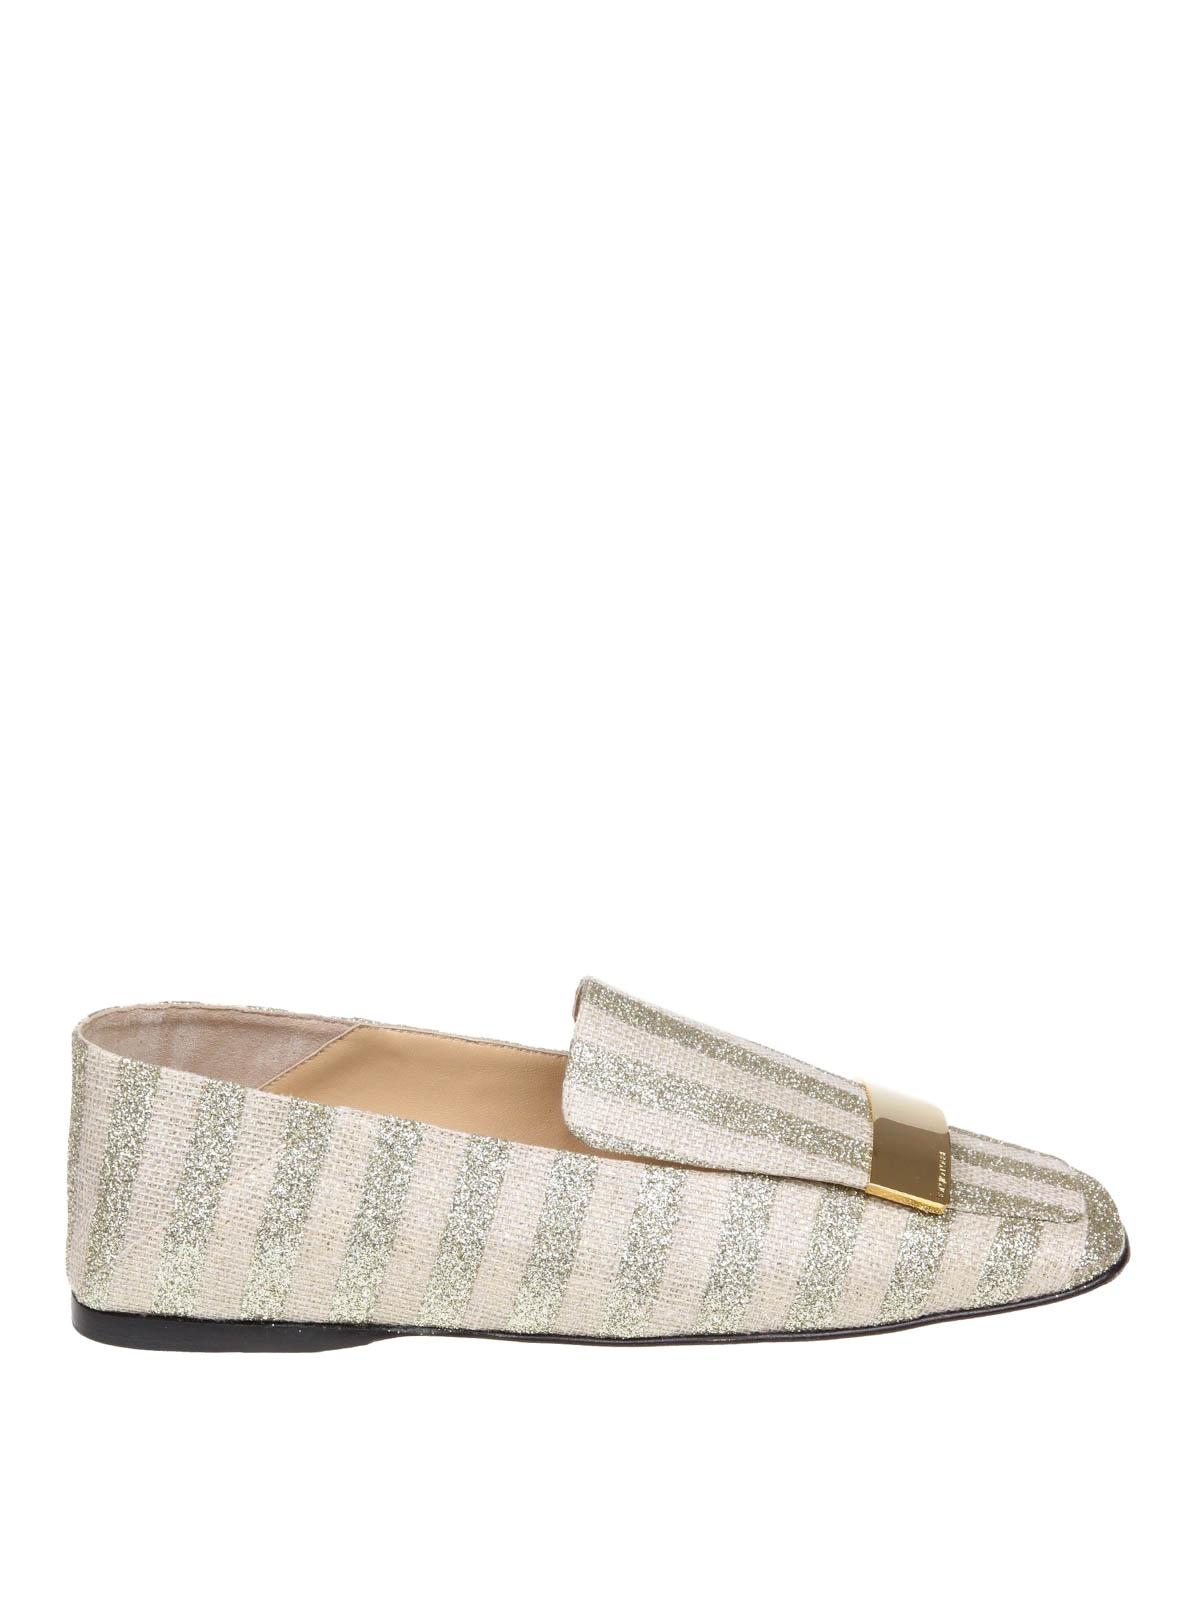 Sergio Rossi Slippers In Laminate Striped Fabric Platinum Color In Gold